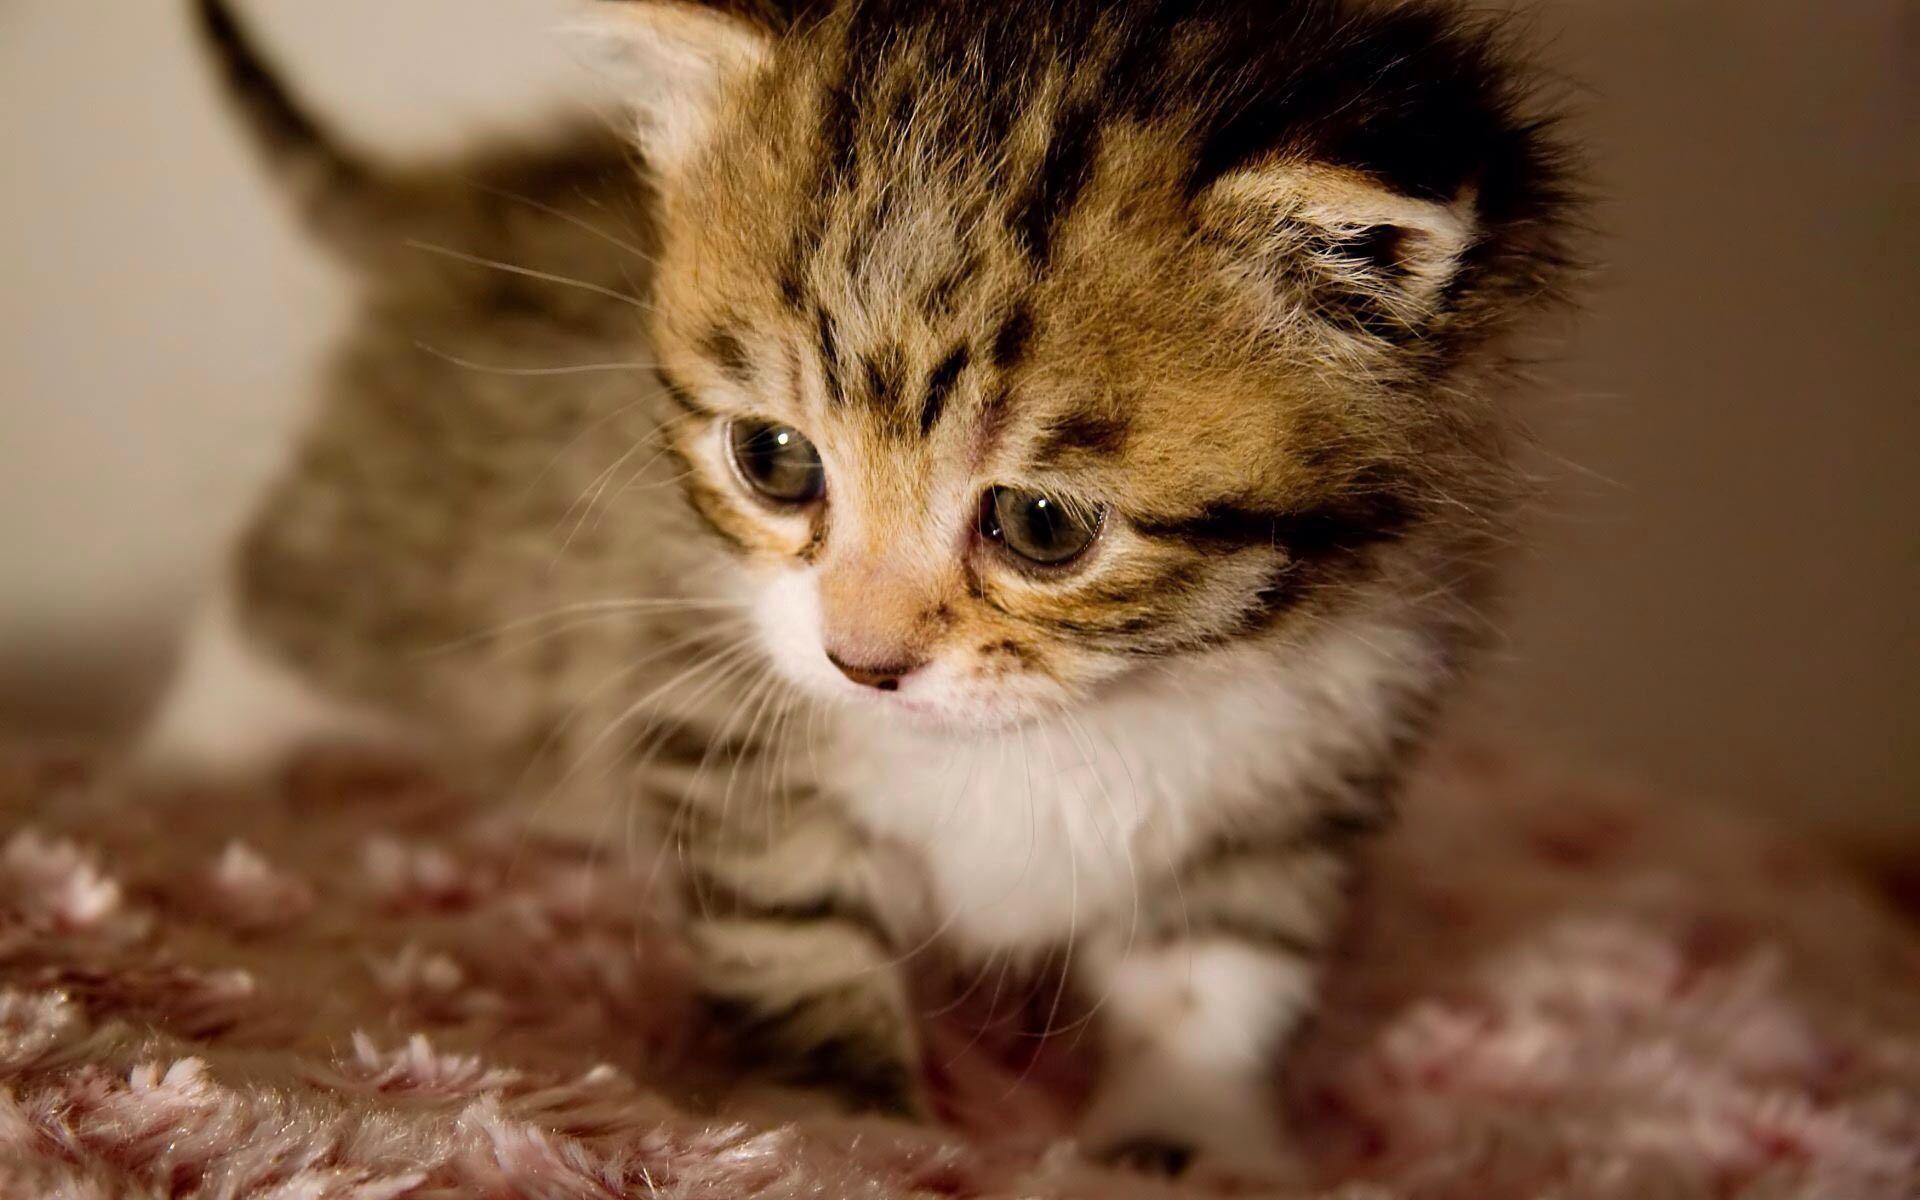 Cute kitten Too cute animals Cute animals Pinterest